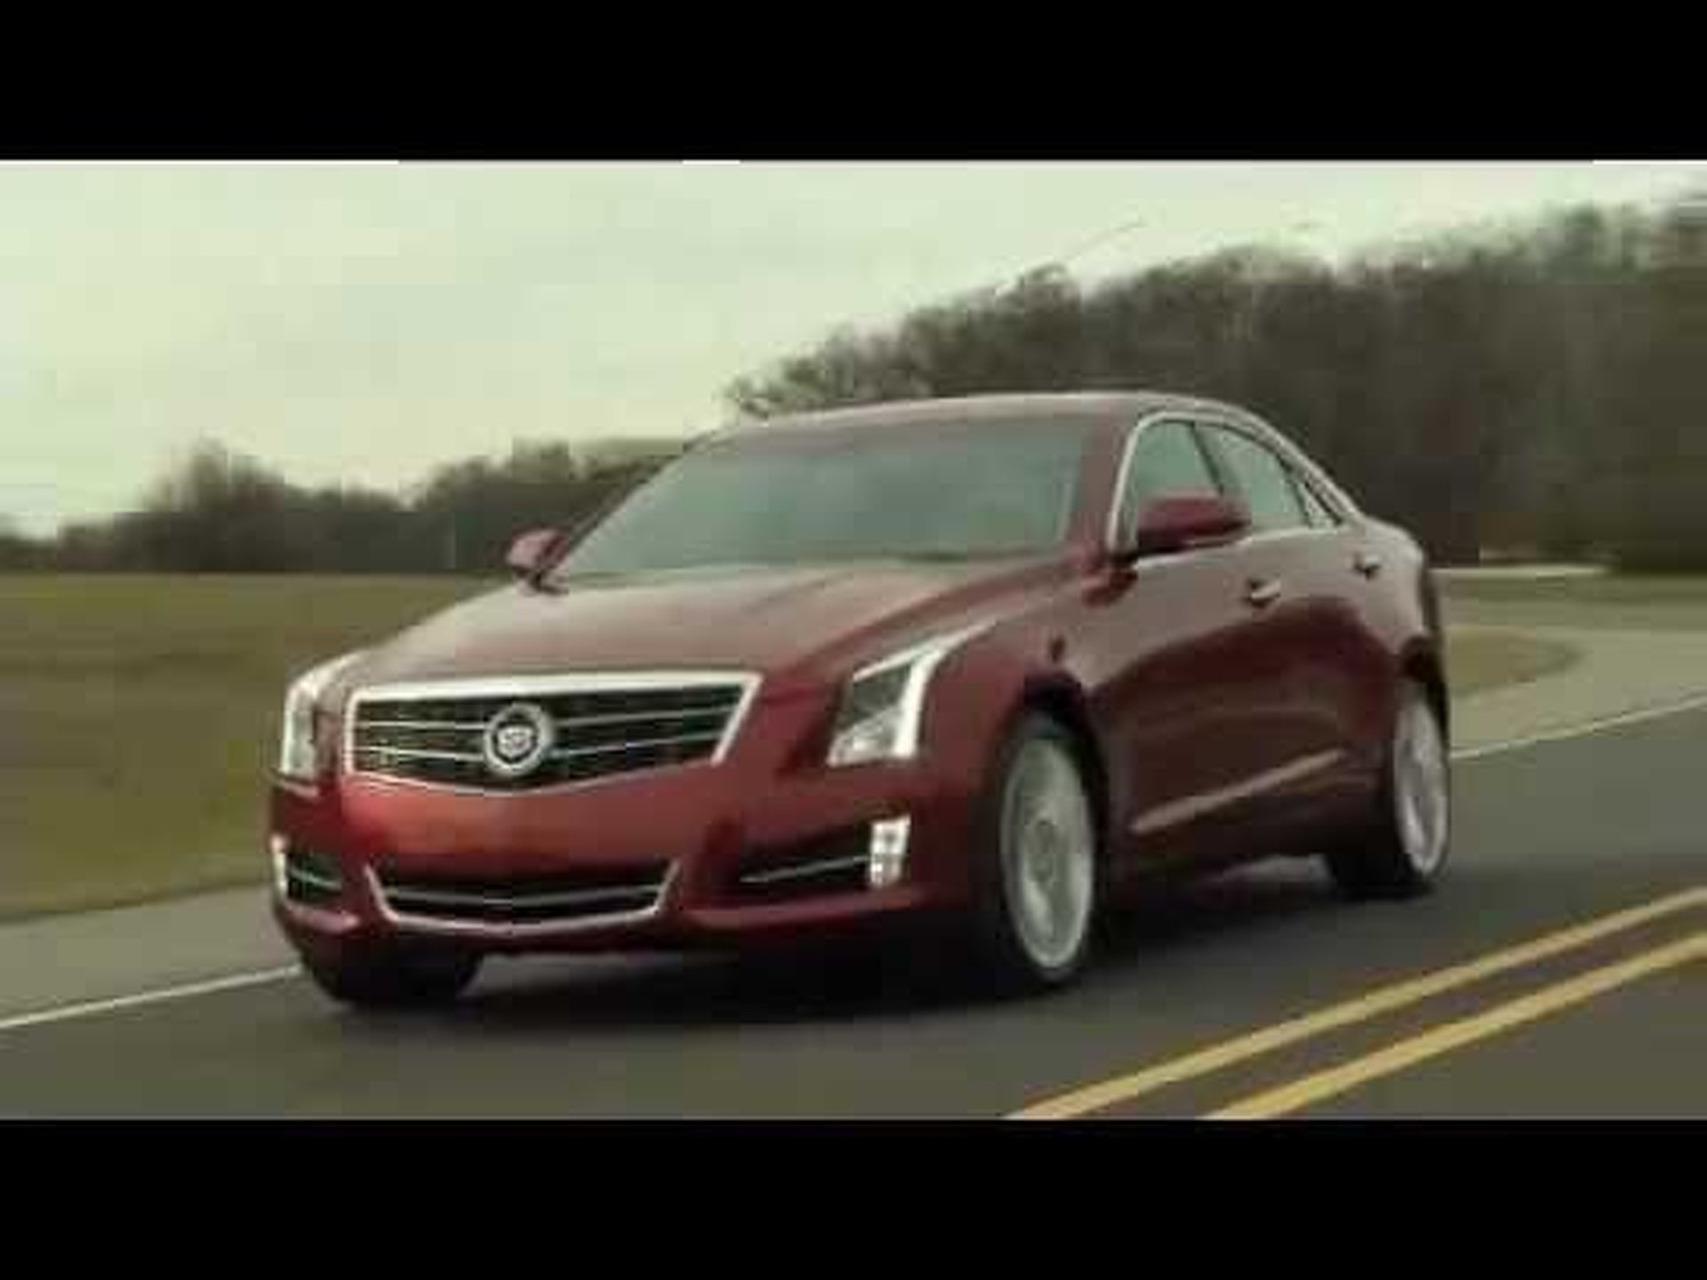 2013 Cadillac ATS Running Footage